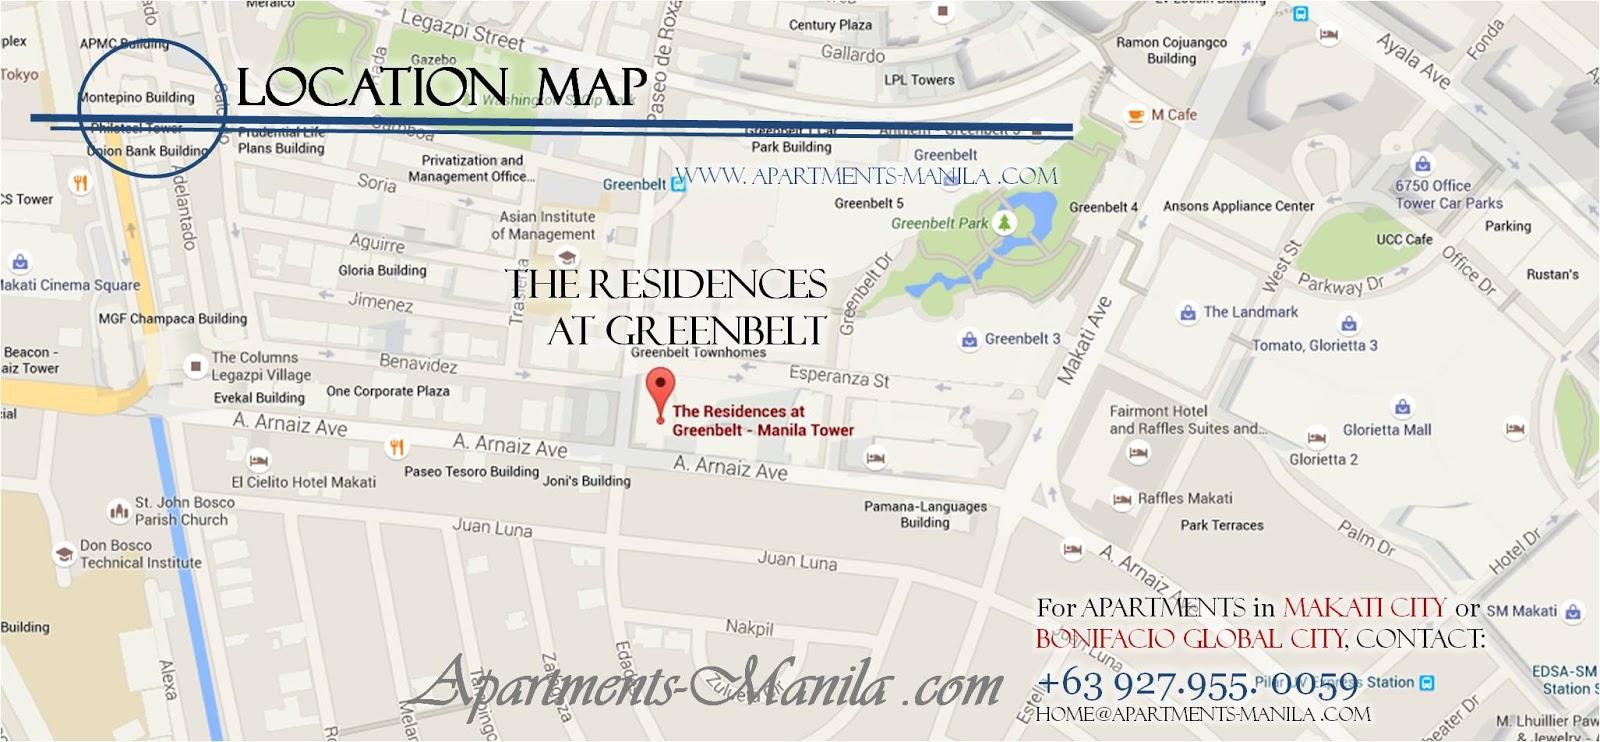 the2bresidences2bat2bgreenbelt2bmakati2b 2blocation2bmap min franchise one hotel map